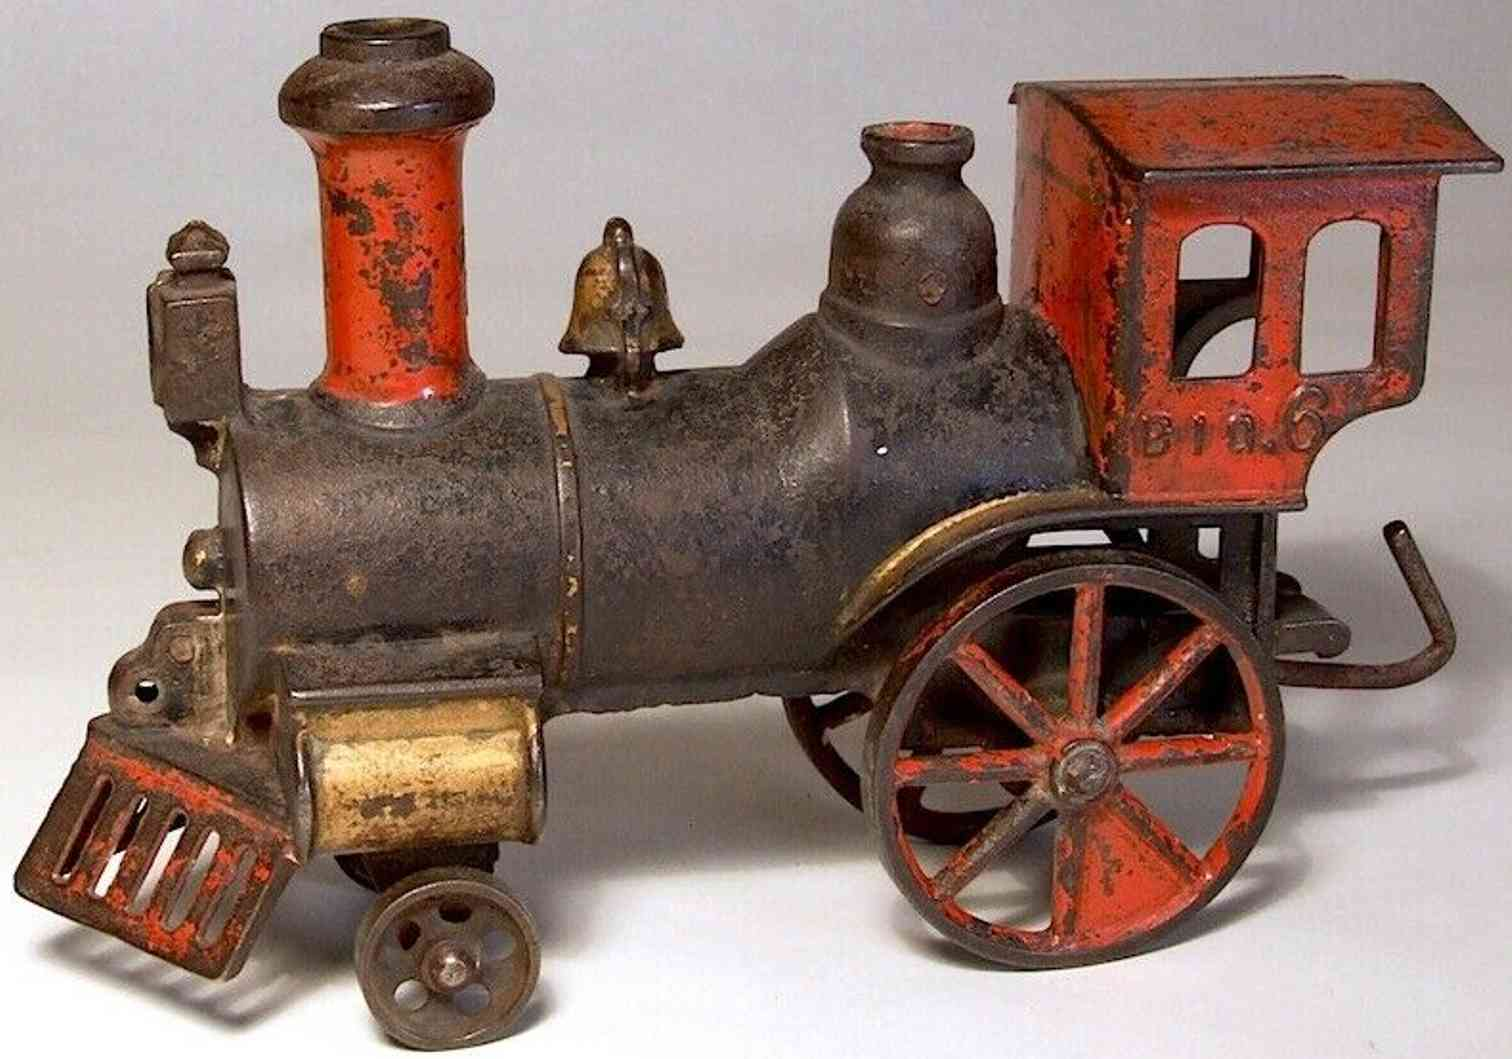 stevens co j & e railway toy cast iron floor locomotive named  big 6